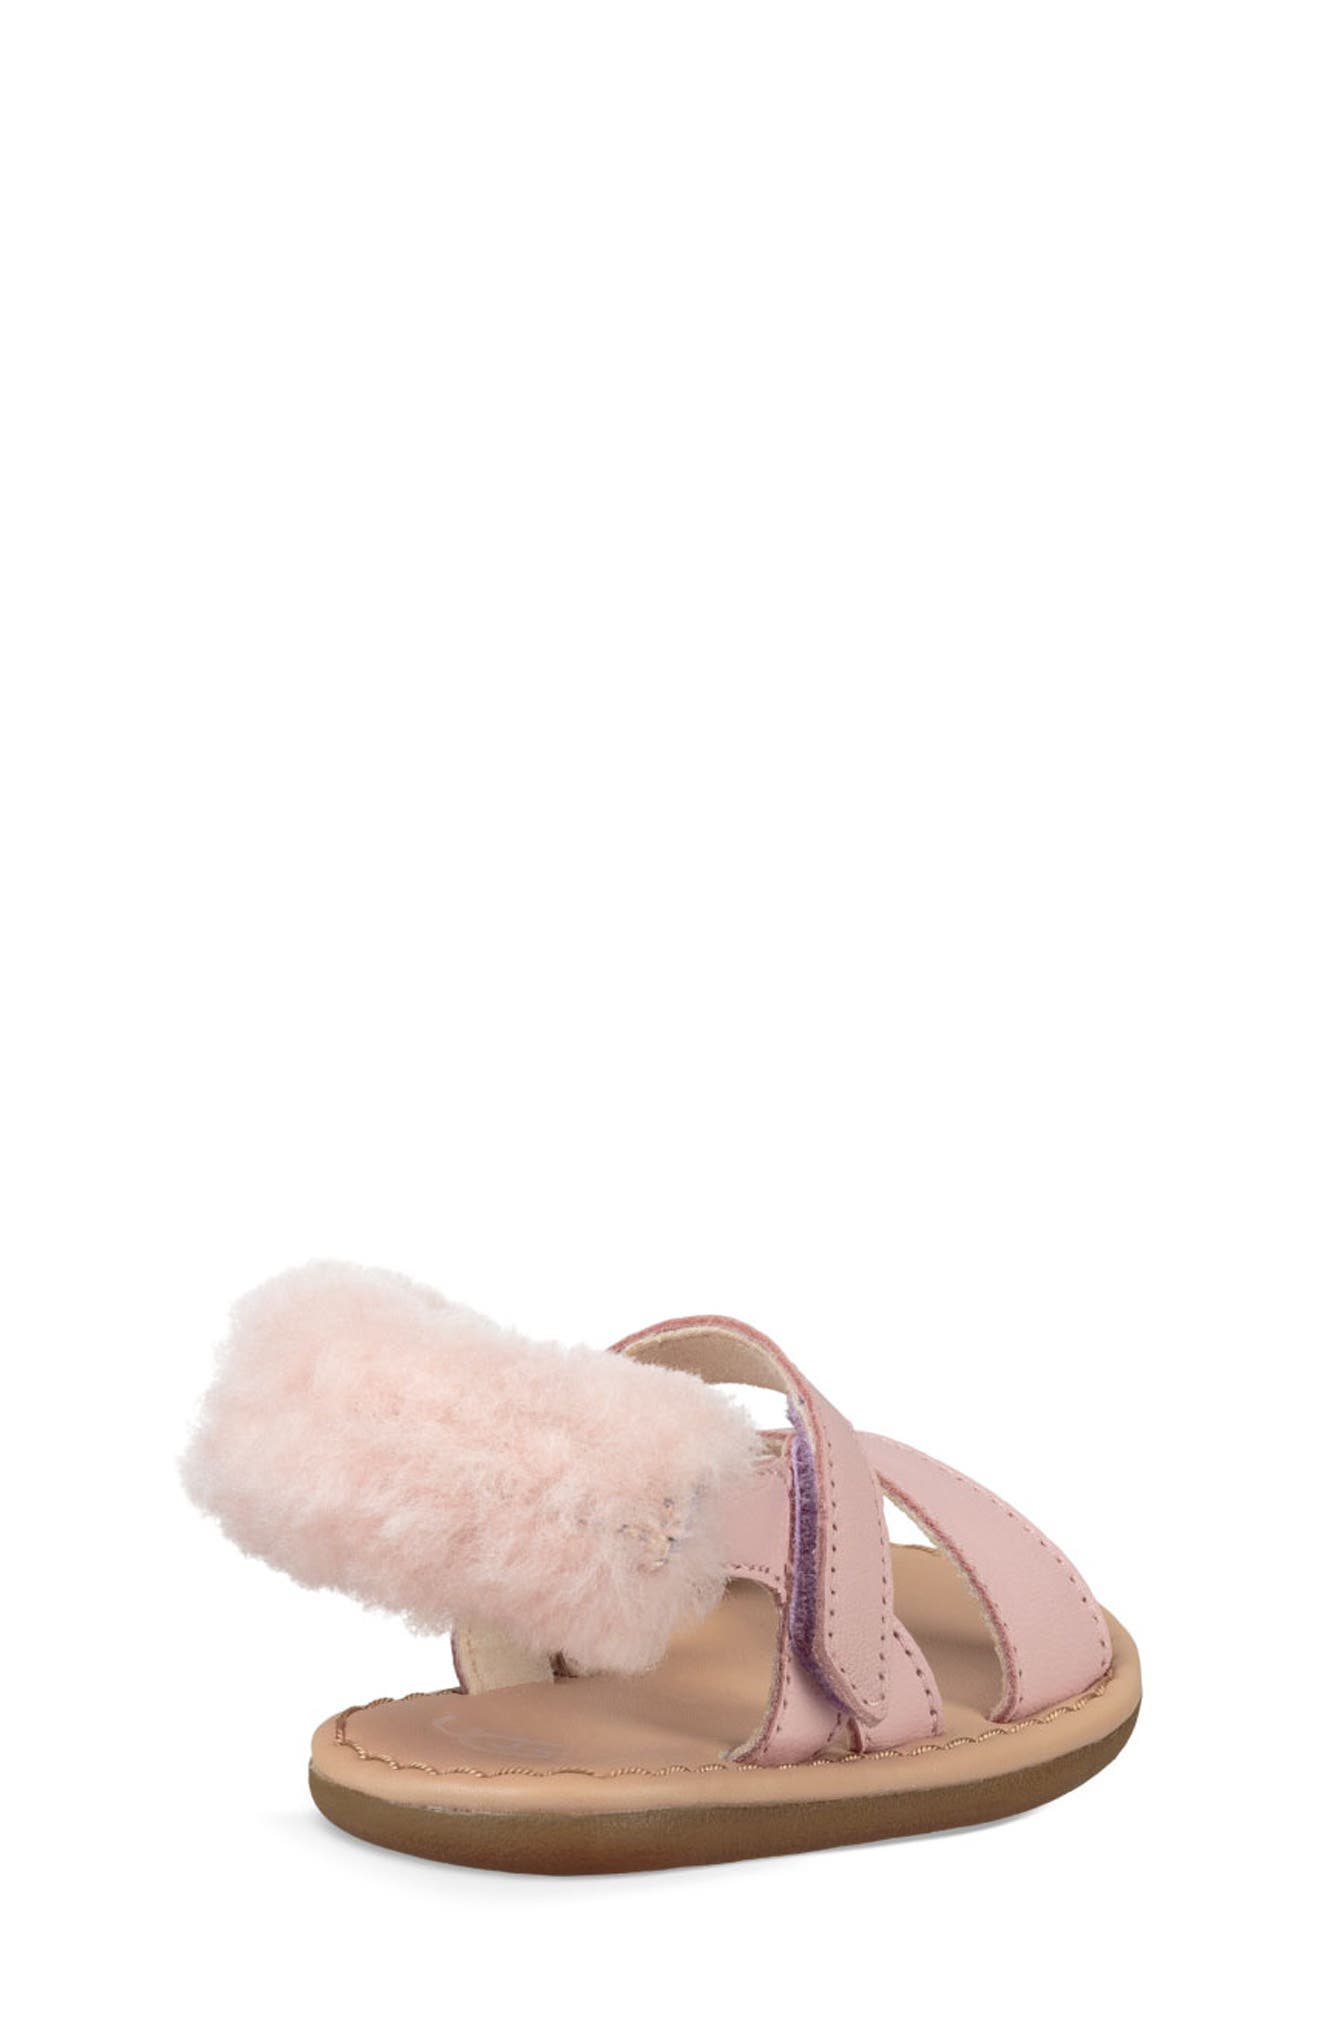 Dorien Genuine Shearling Trim Sandal,                             Alternate thumbnail 2, color,                             PETAL